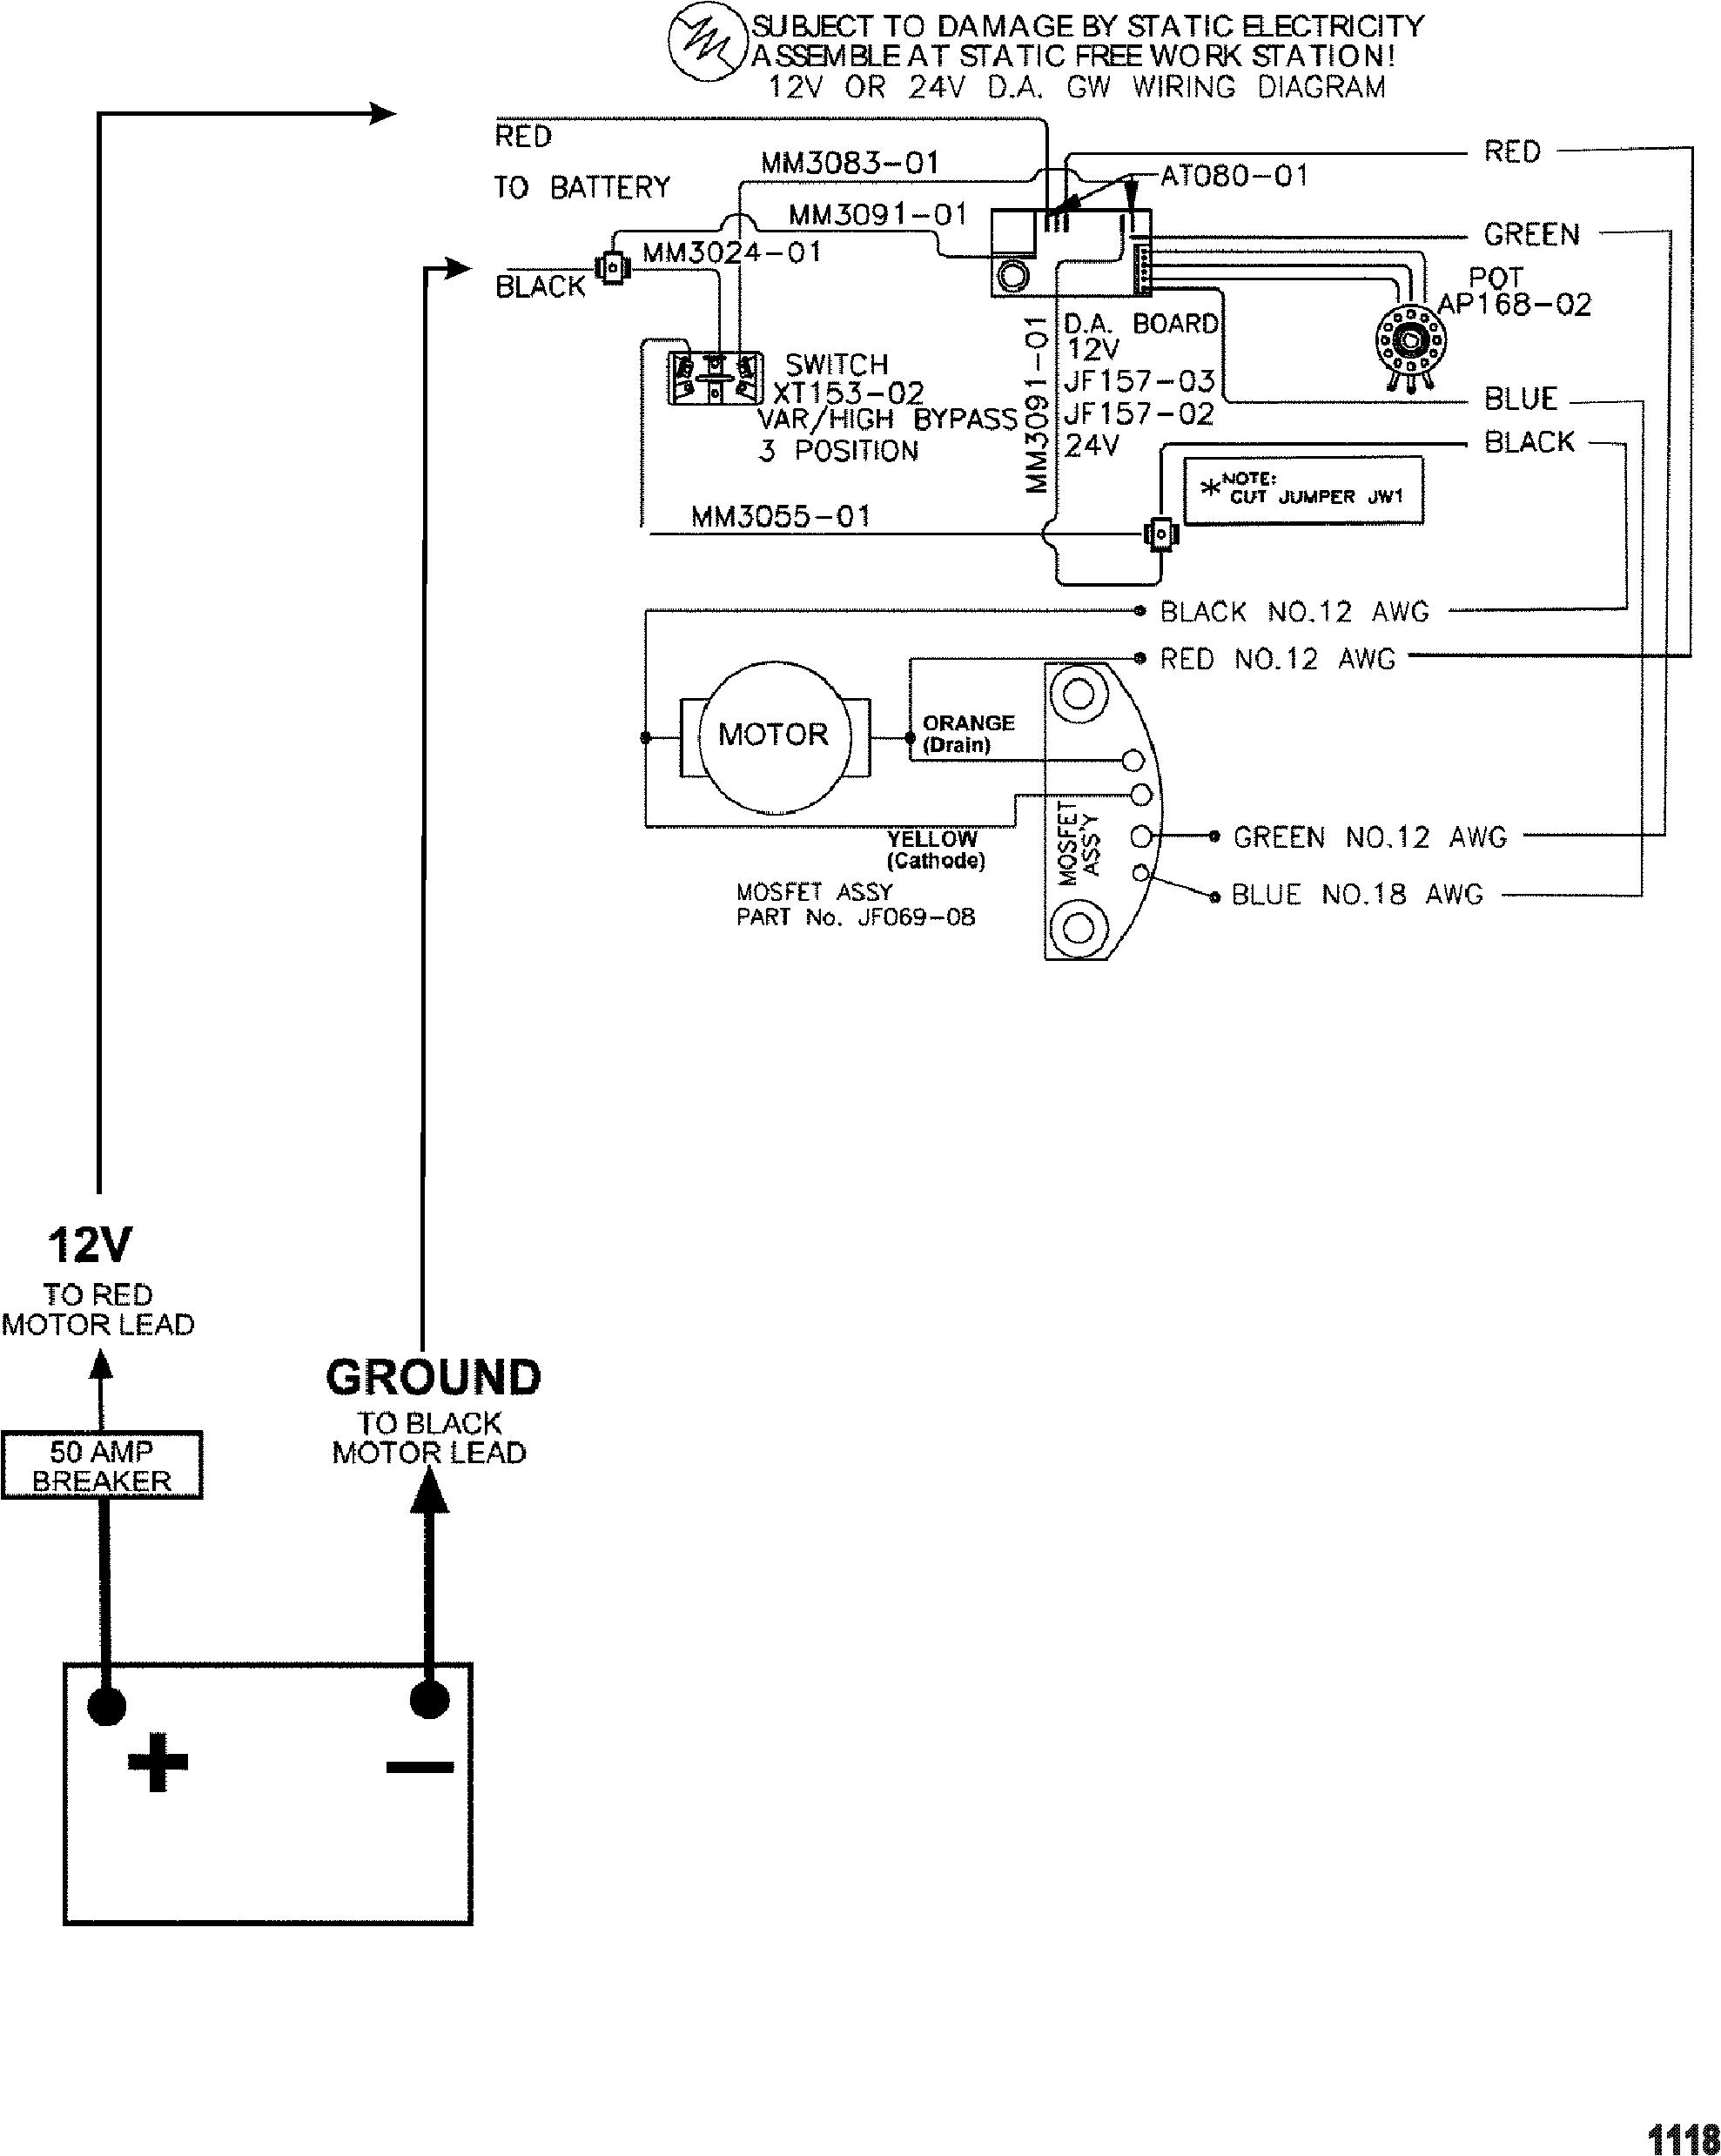 motorguide v wiring diagram motorguide image mercury thruster trolling motor wiring diagram jodebal com on motorguide 24v wiring diagram